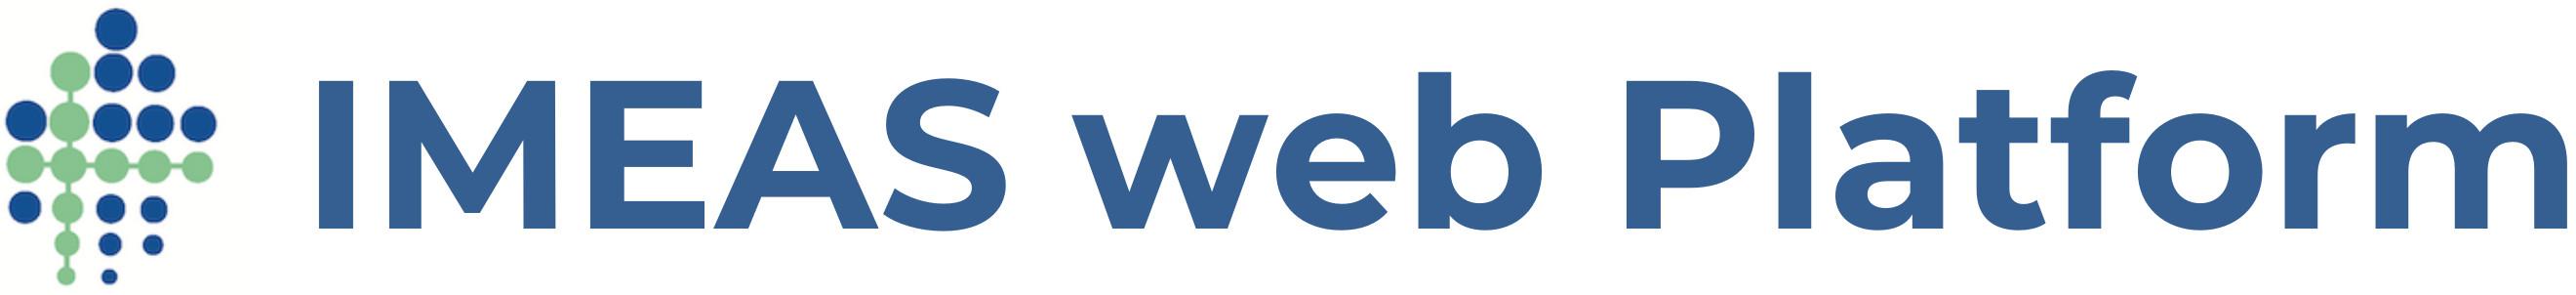 IMEAS web Platform